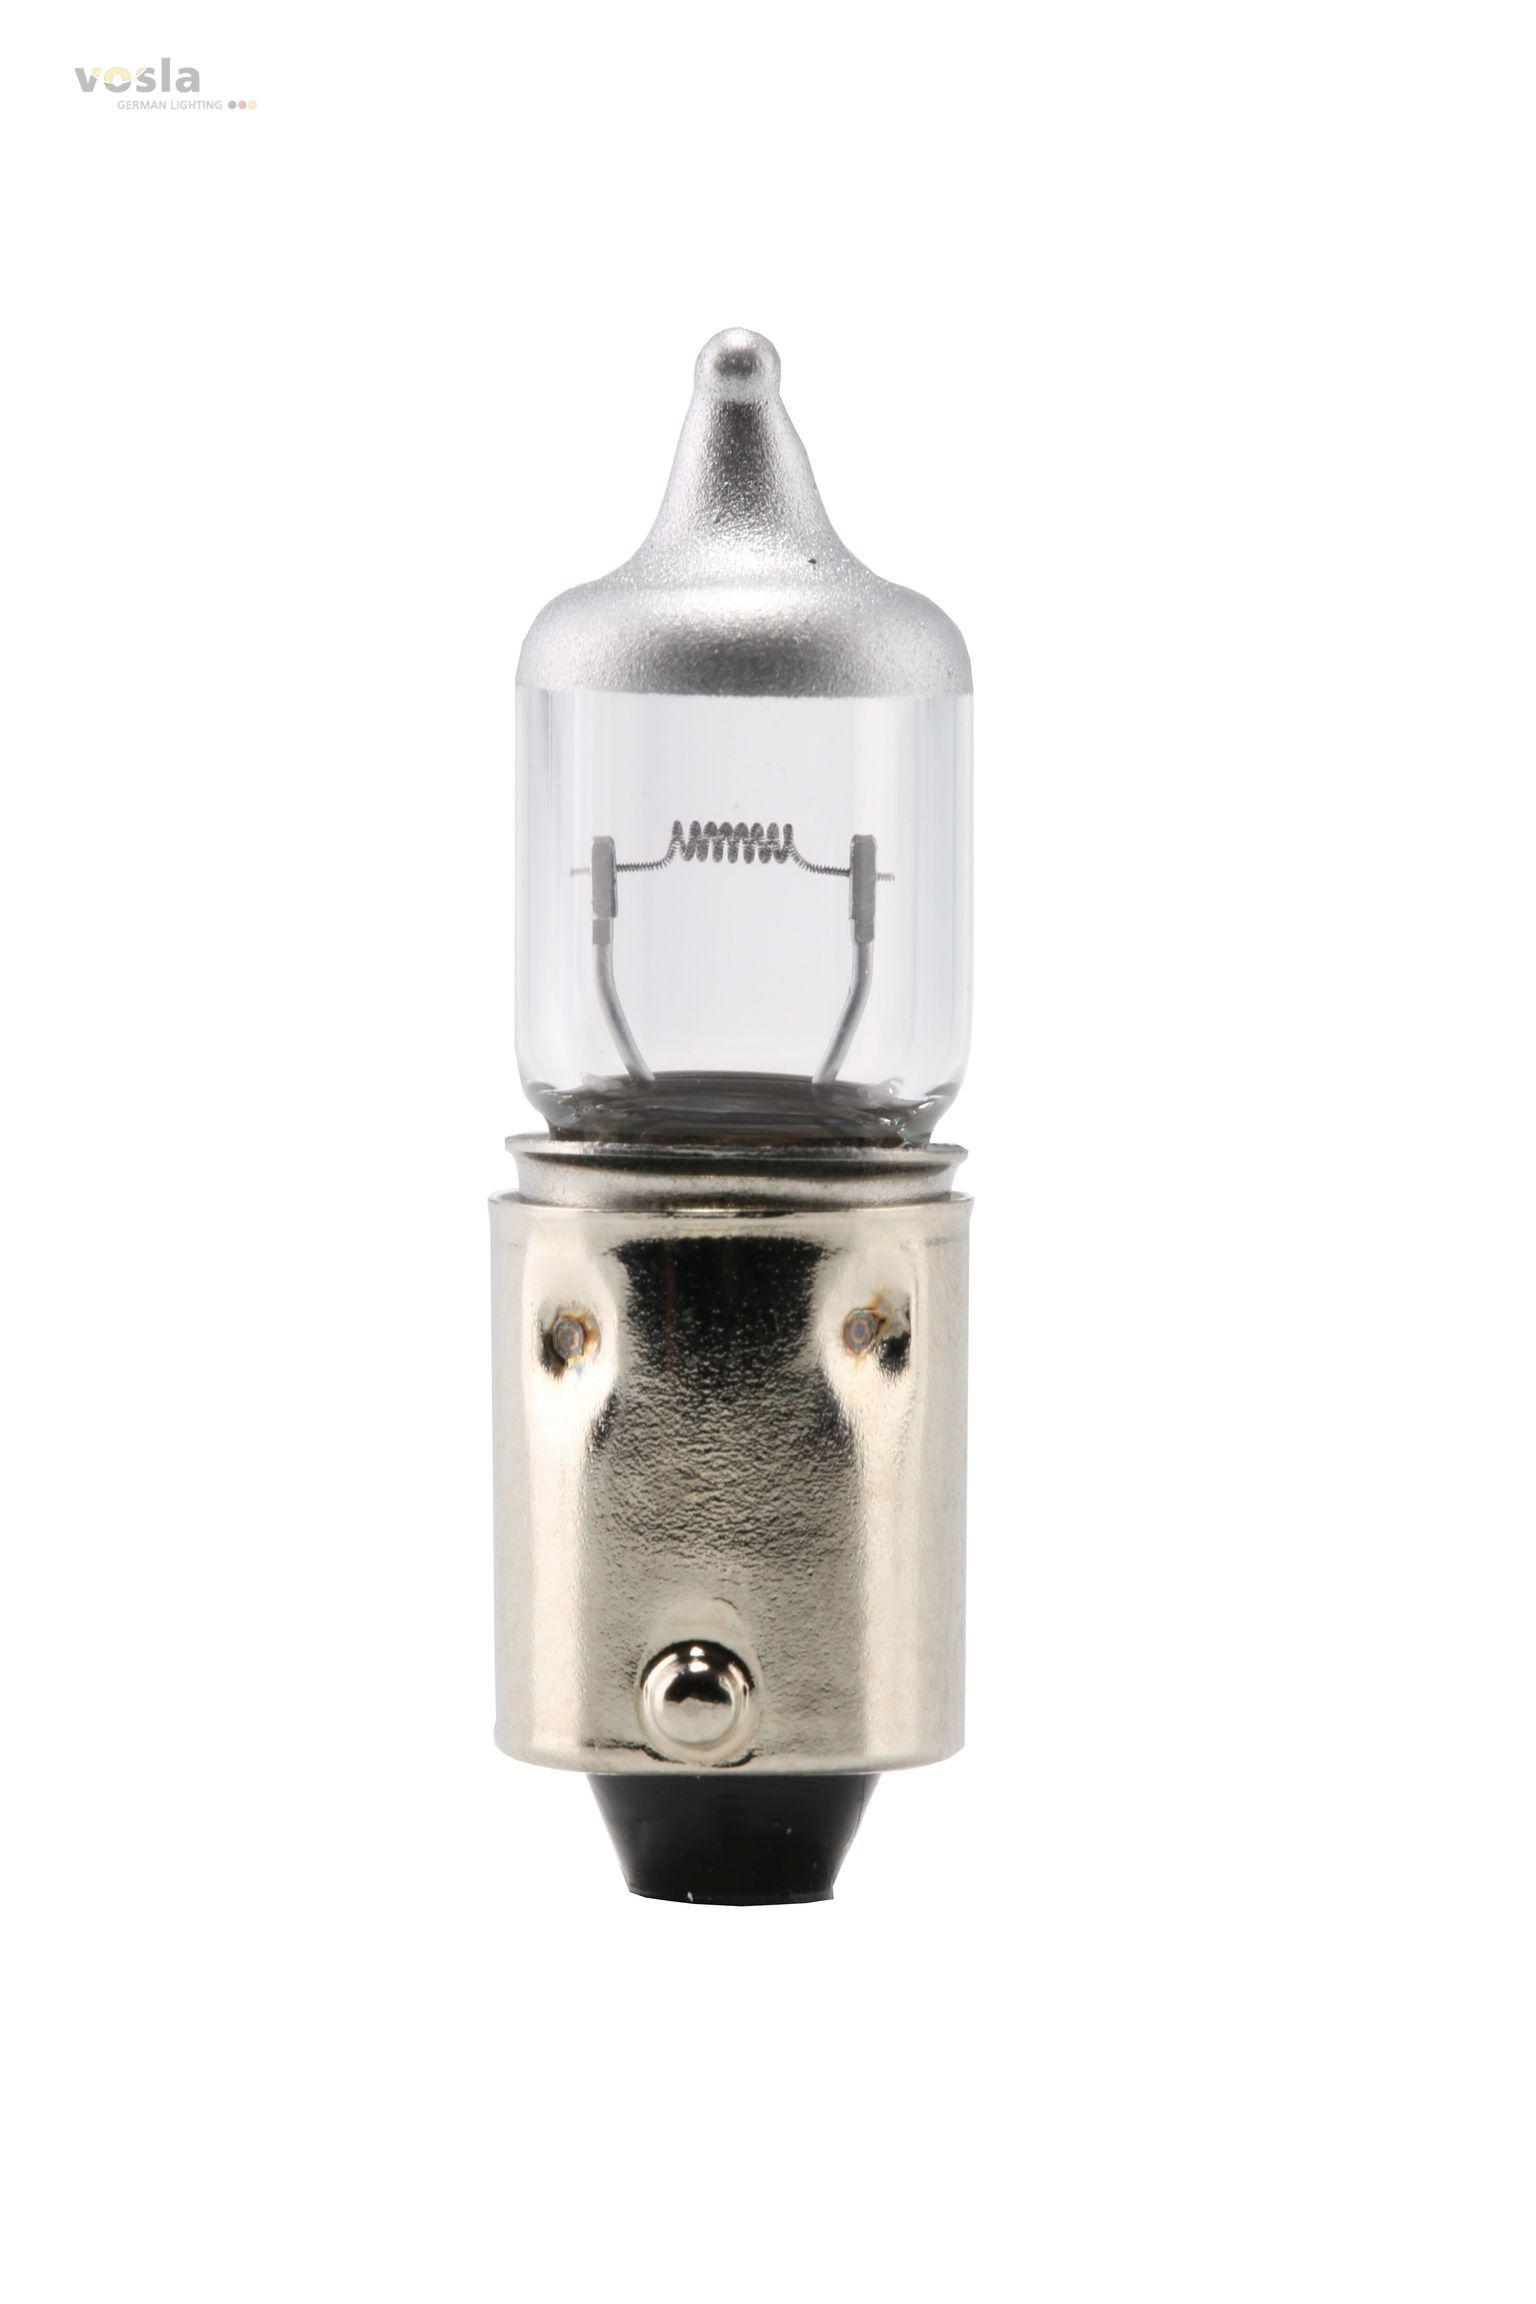 HMB60 28 V 11.5 W BA9s Image